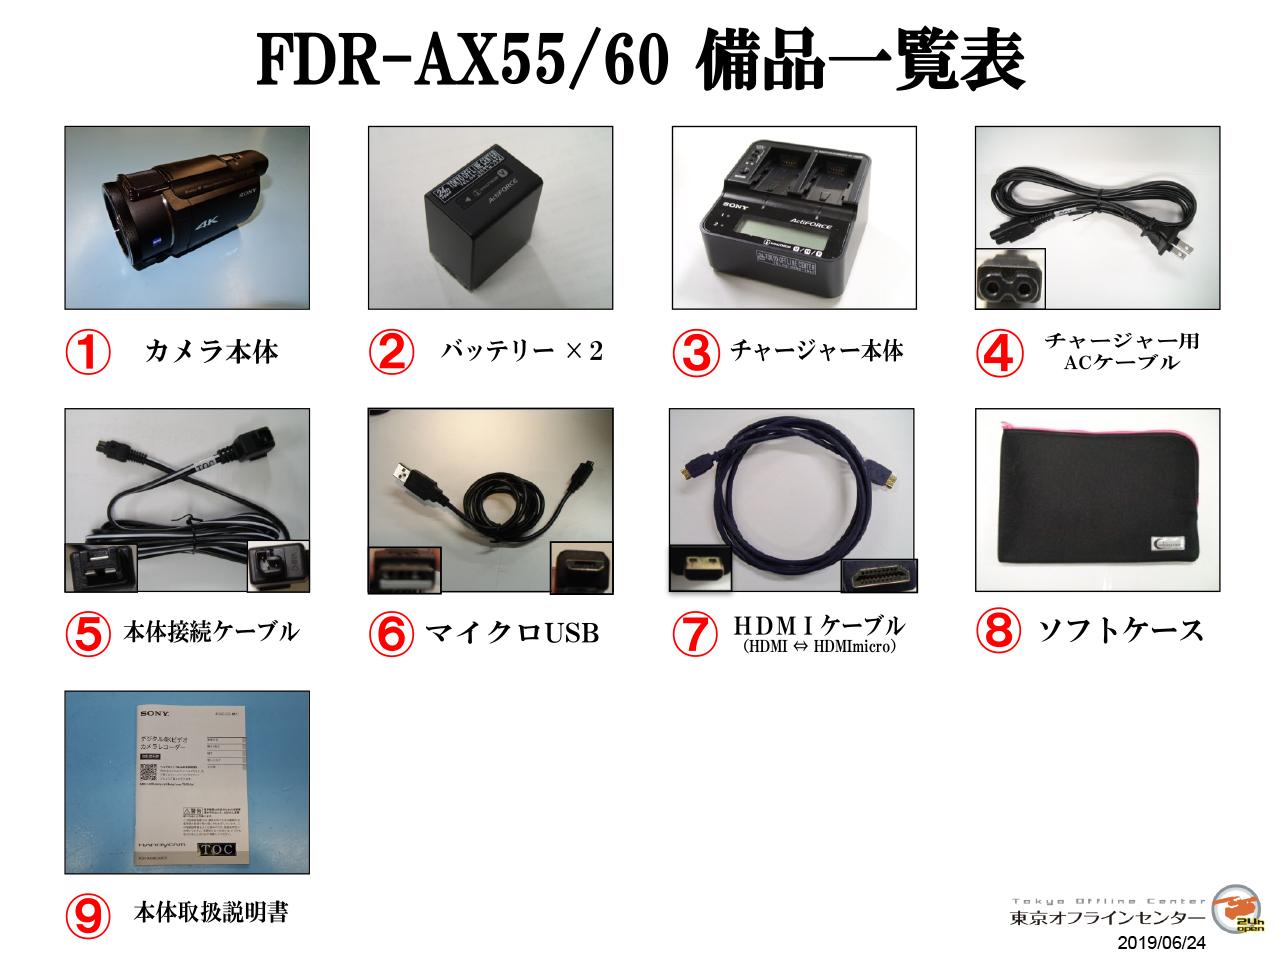 FDR-AX55 備品一覧